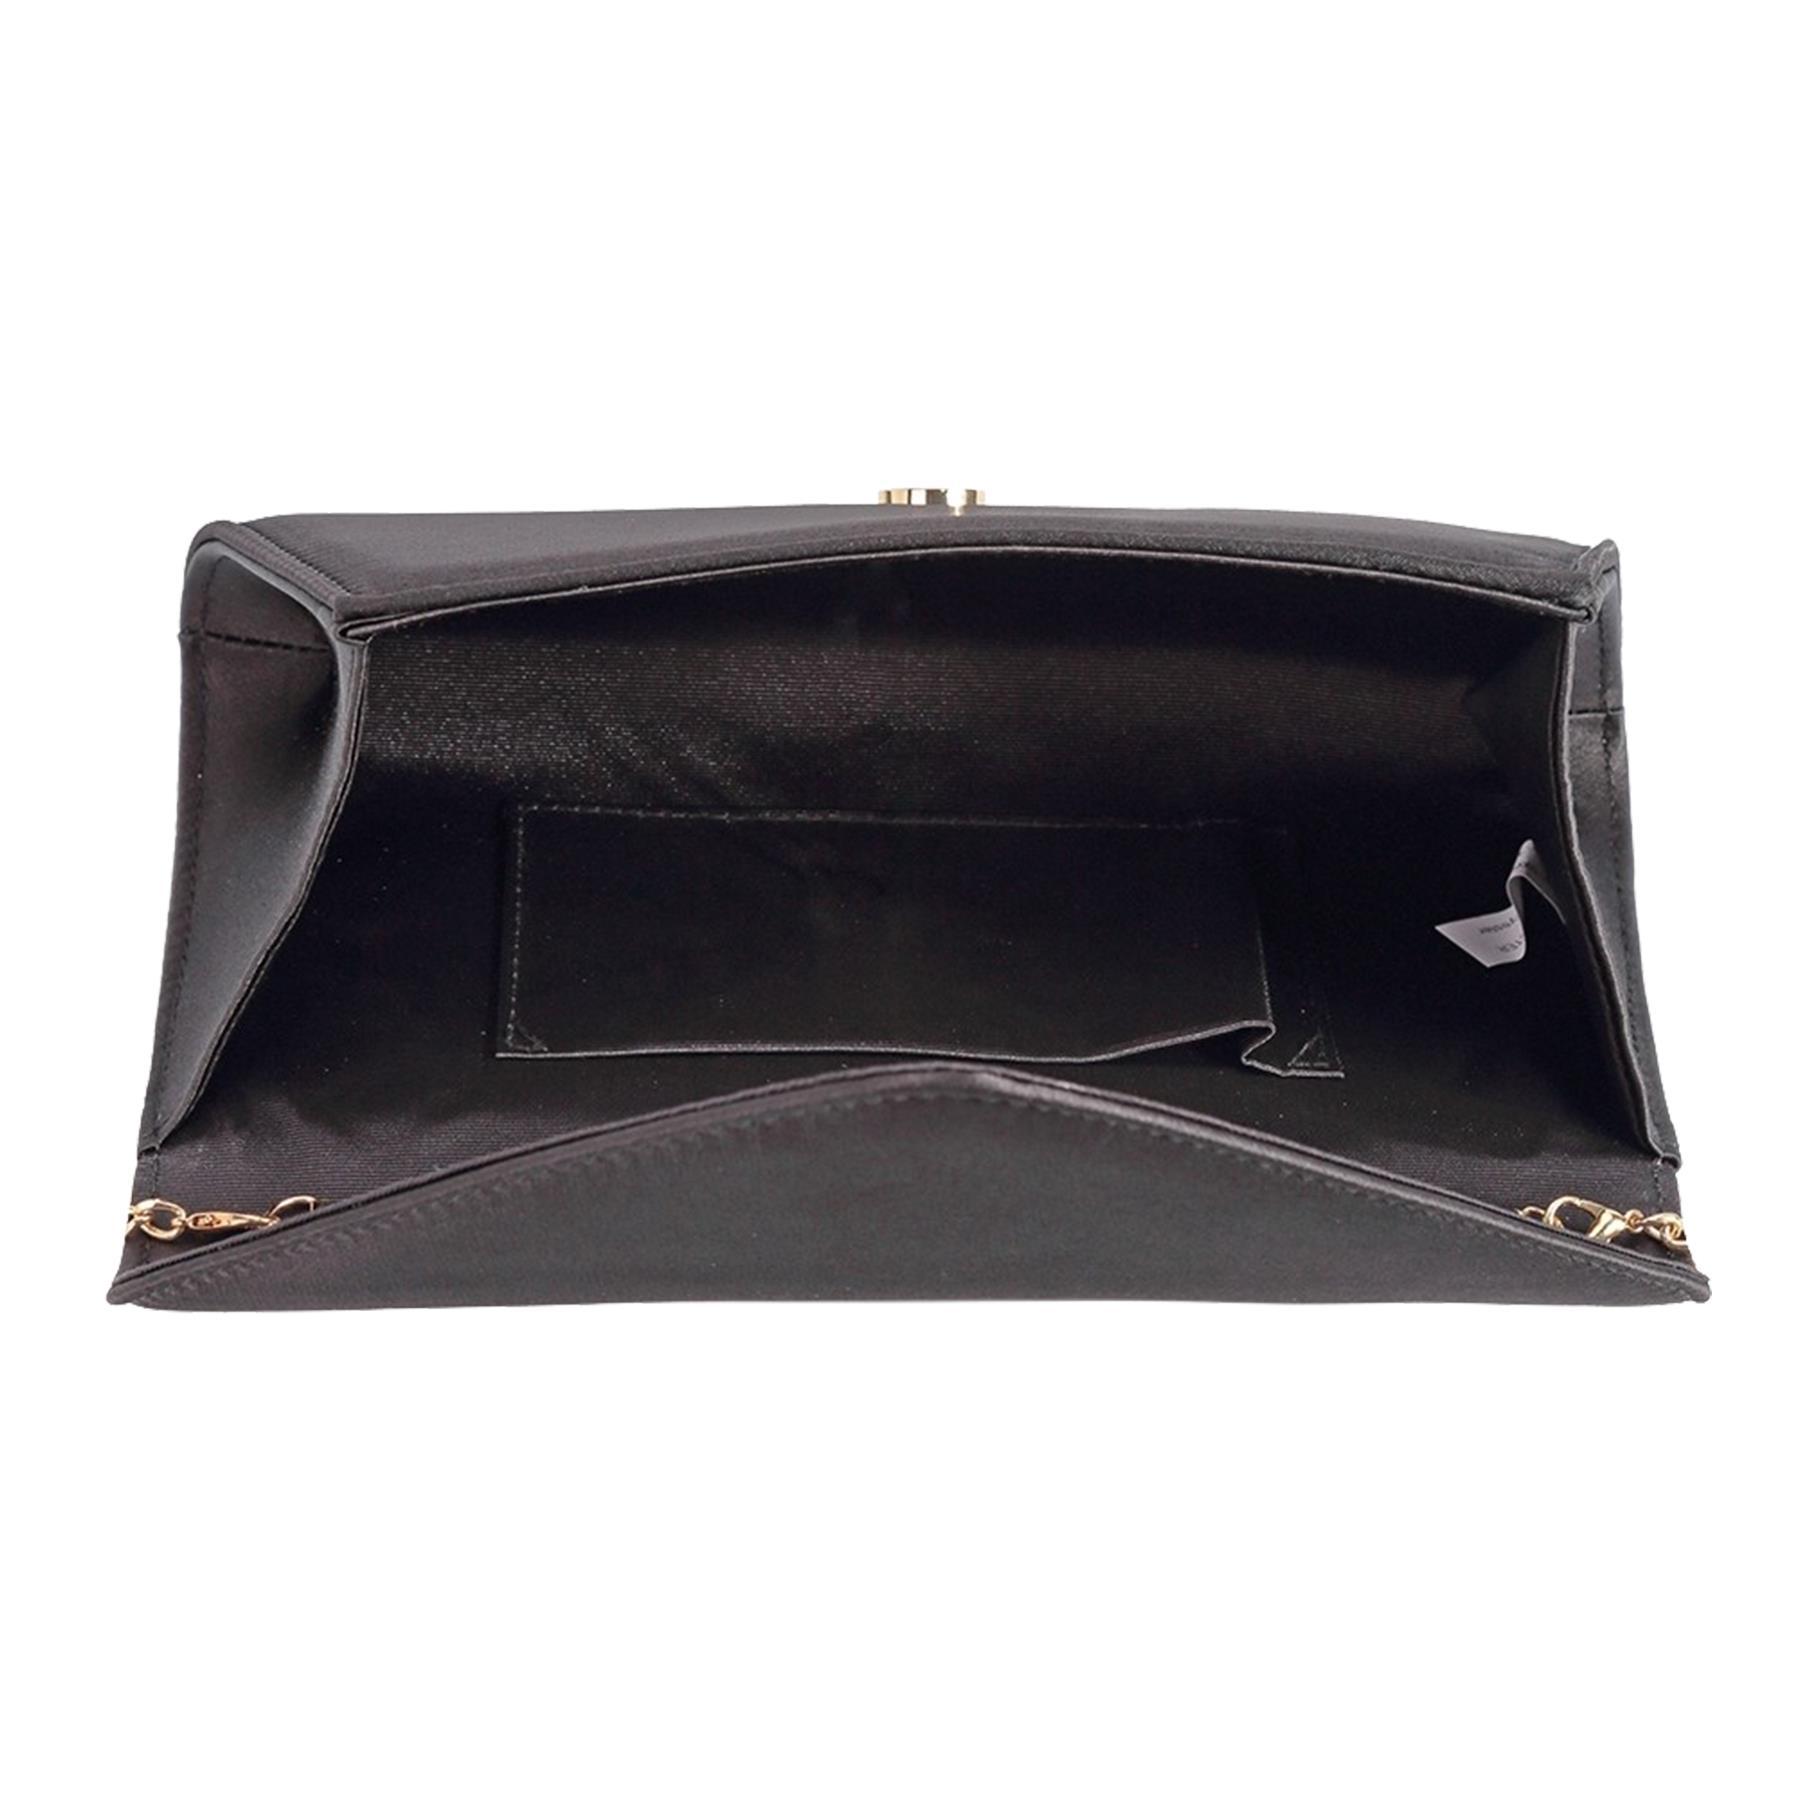 New-Ladies-Stylish-3D-Envelope-Satin-Prom-Party-Clutch-Bag-Purse thumbnail 4